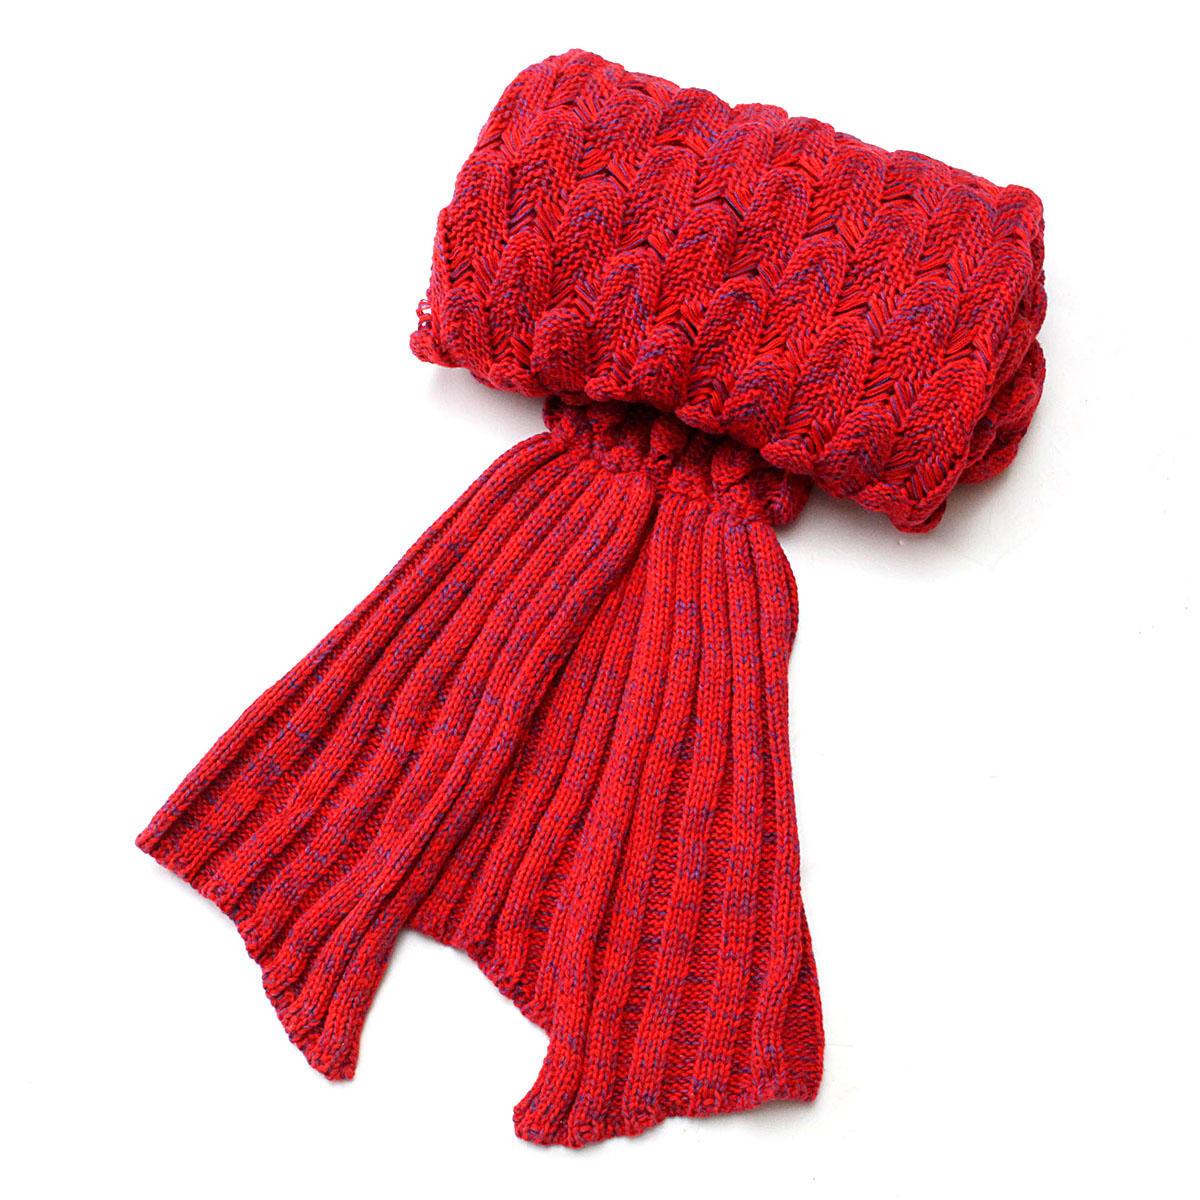 195x90cm Yarn Knitted Mermaid Tail Blankets Handmade Crochet Throw Super Soft Sofa Bed Mat - 7